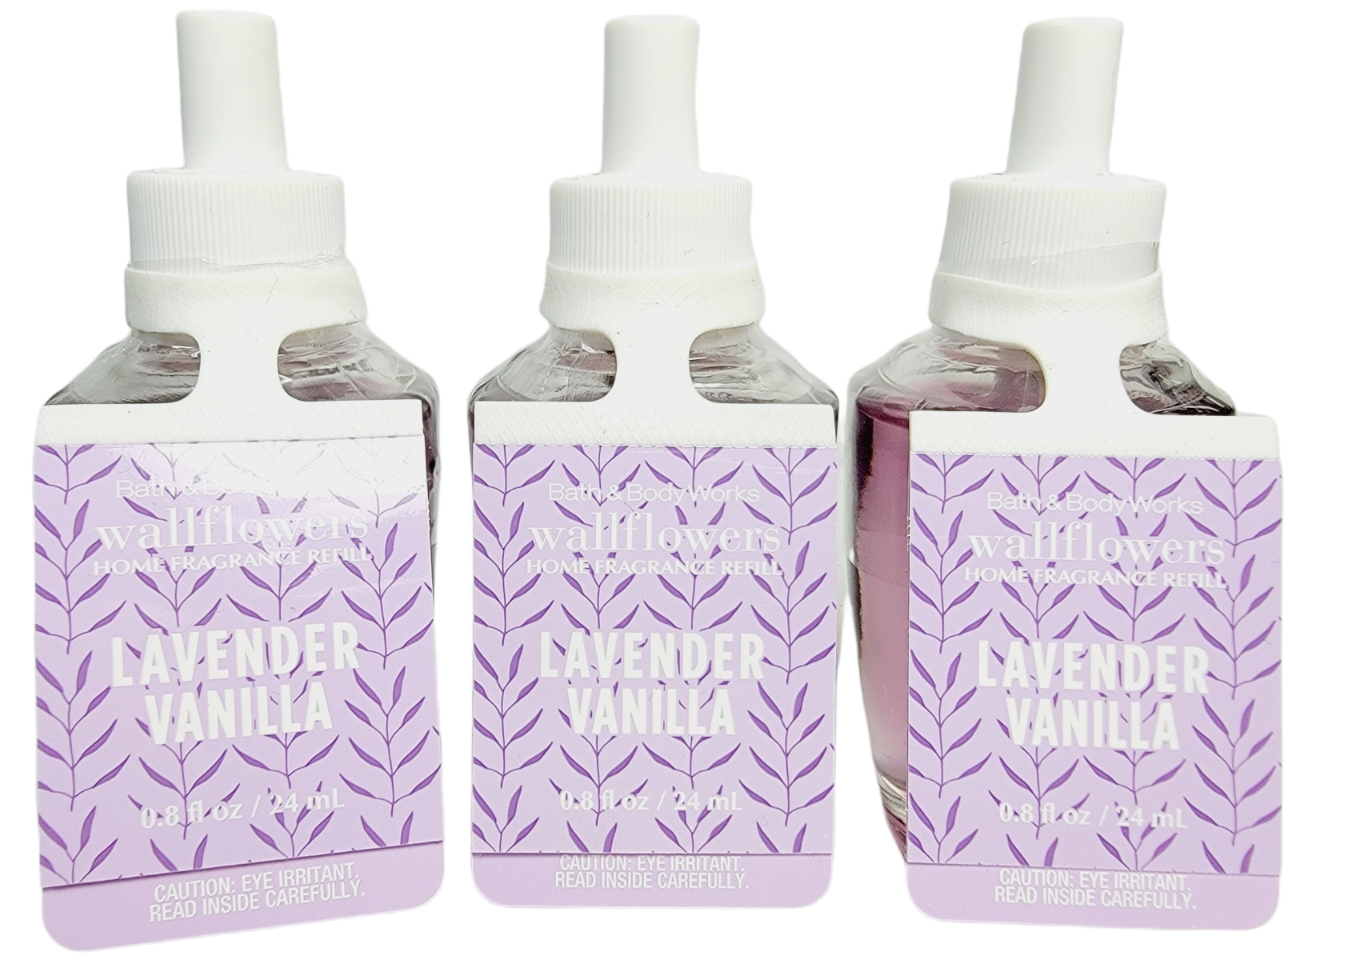 3 Bath & Body Works LAVENDER VANILLA Wallflower Refill Bulbs Home Fragrance NEW - $23.17